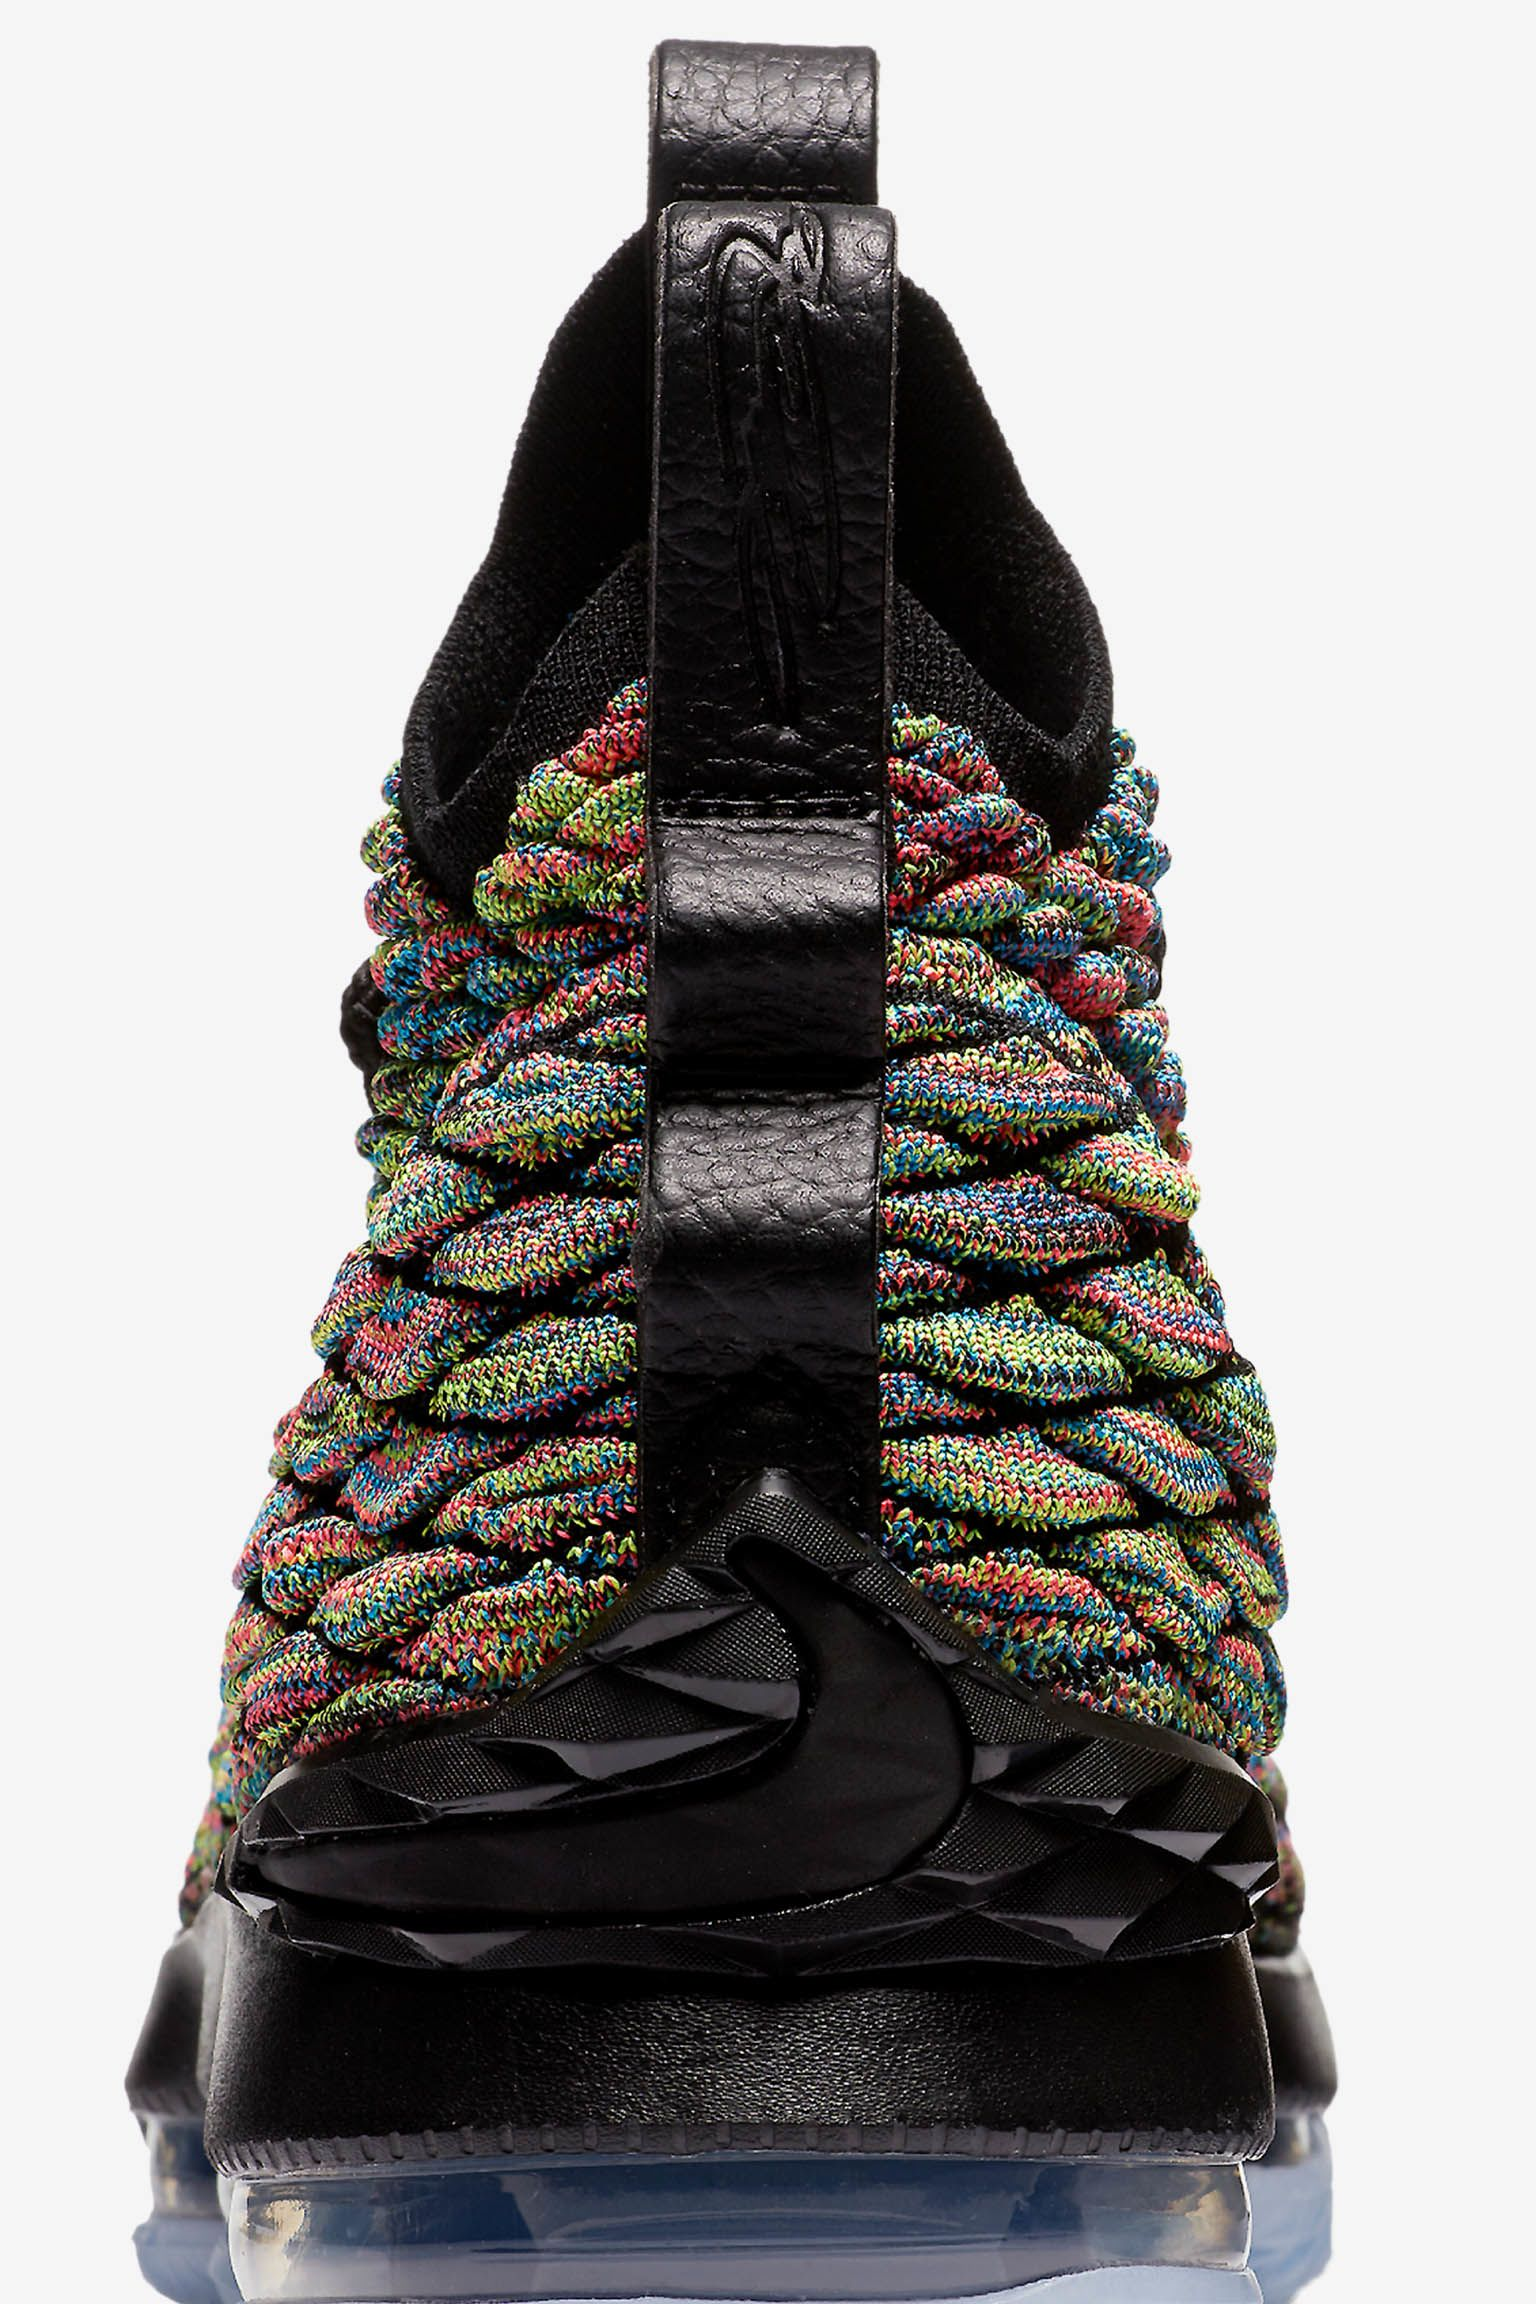 【NIKE公式】ナイキ レブロン 15 BG 'Black & Multicolor' (922811-901 / Lebron 15)